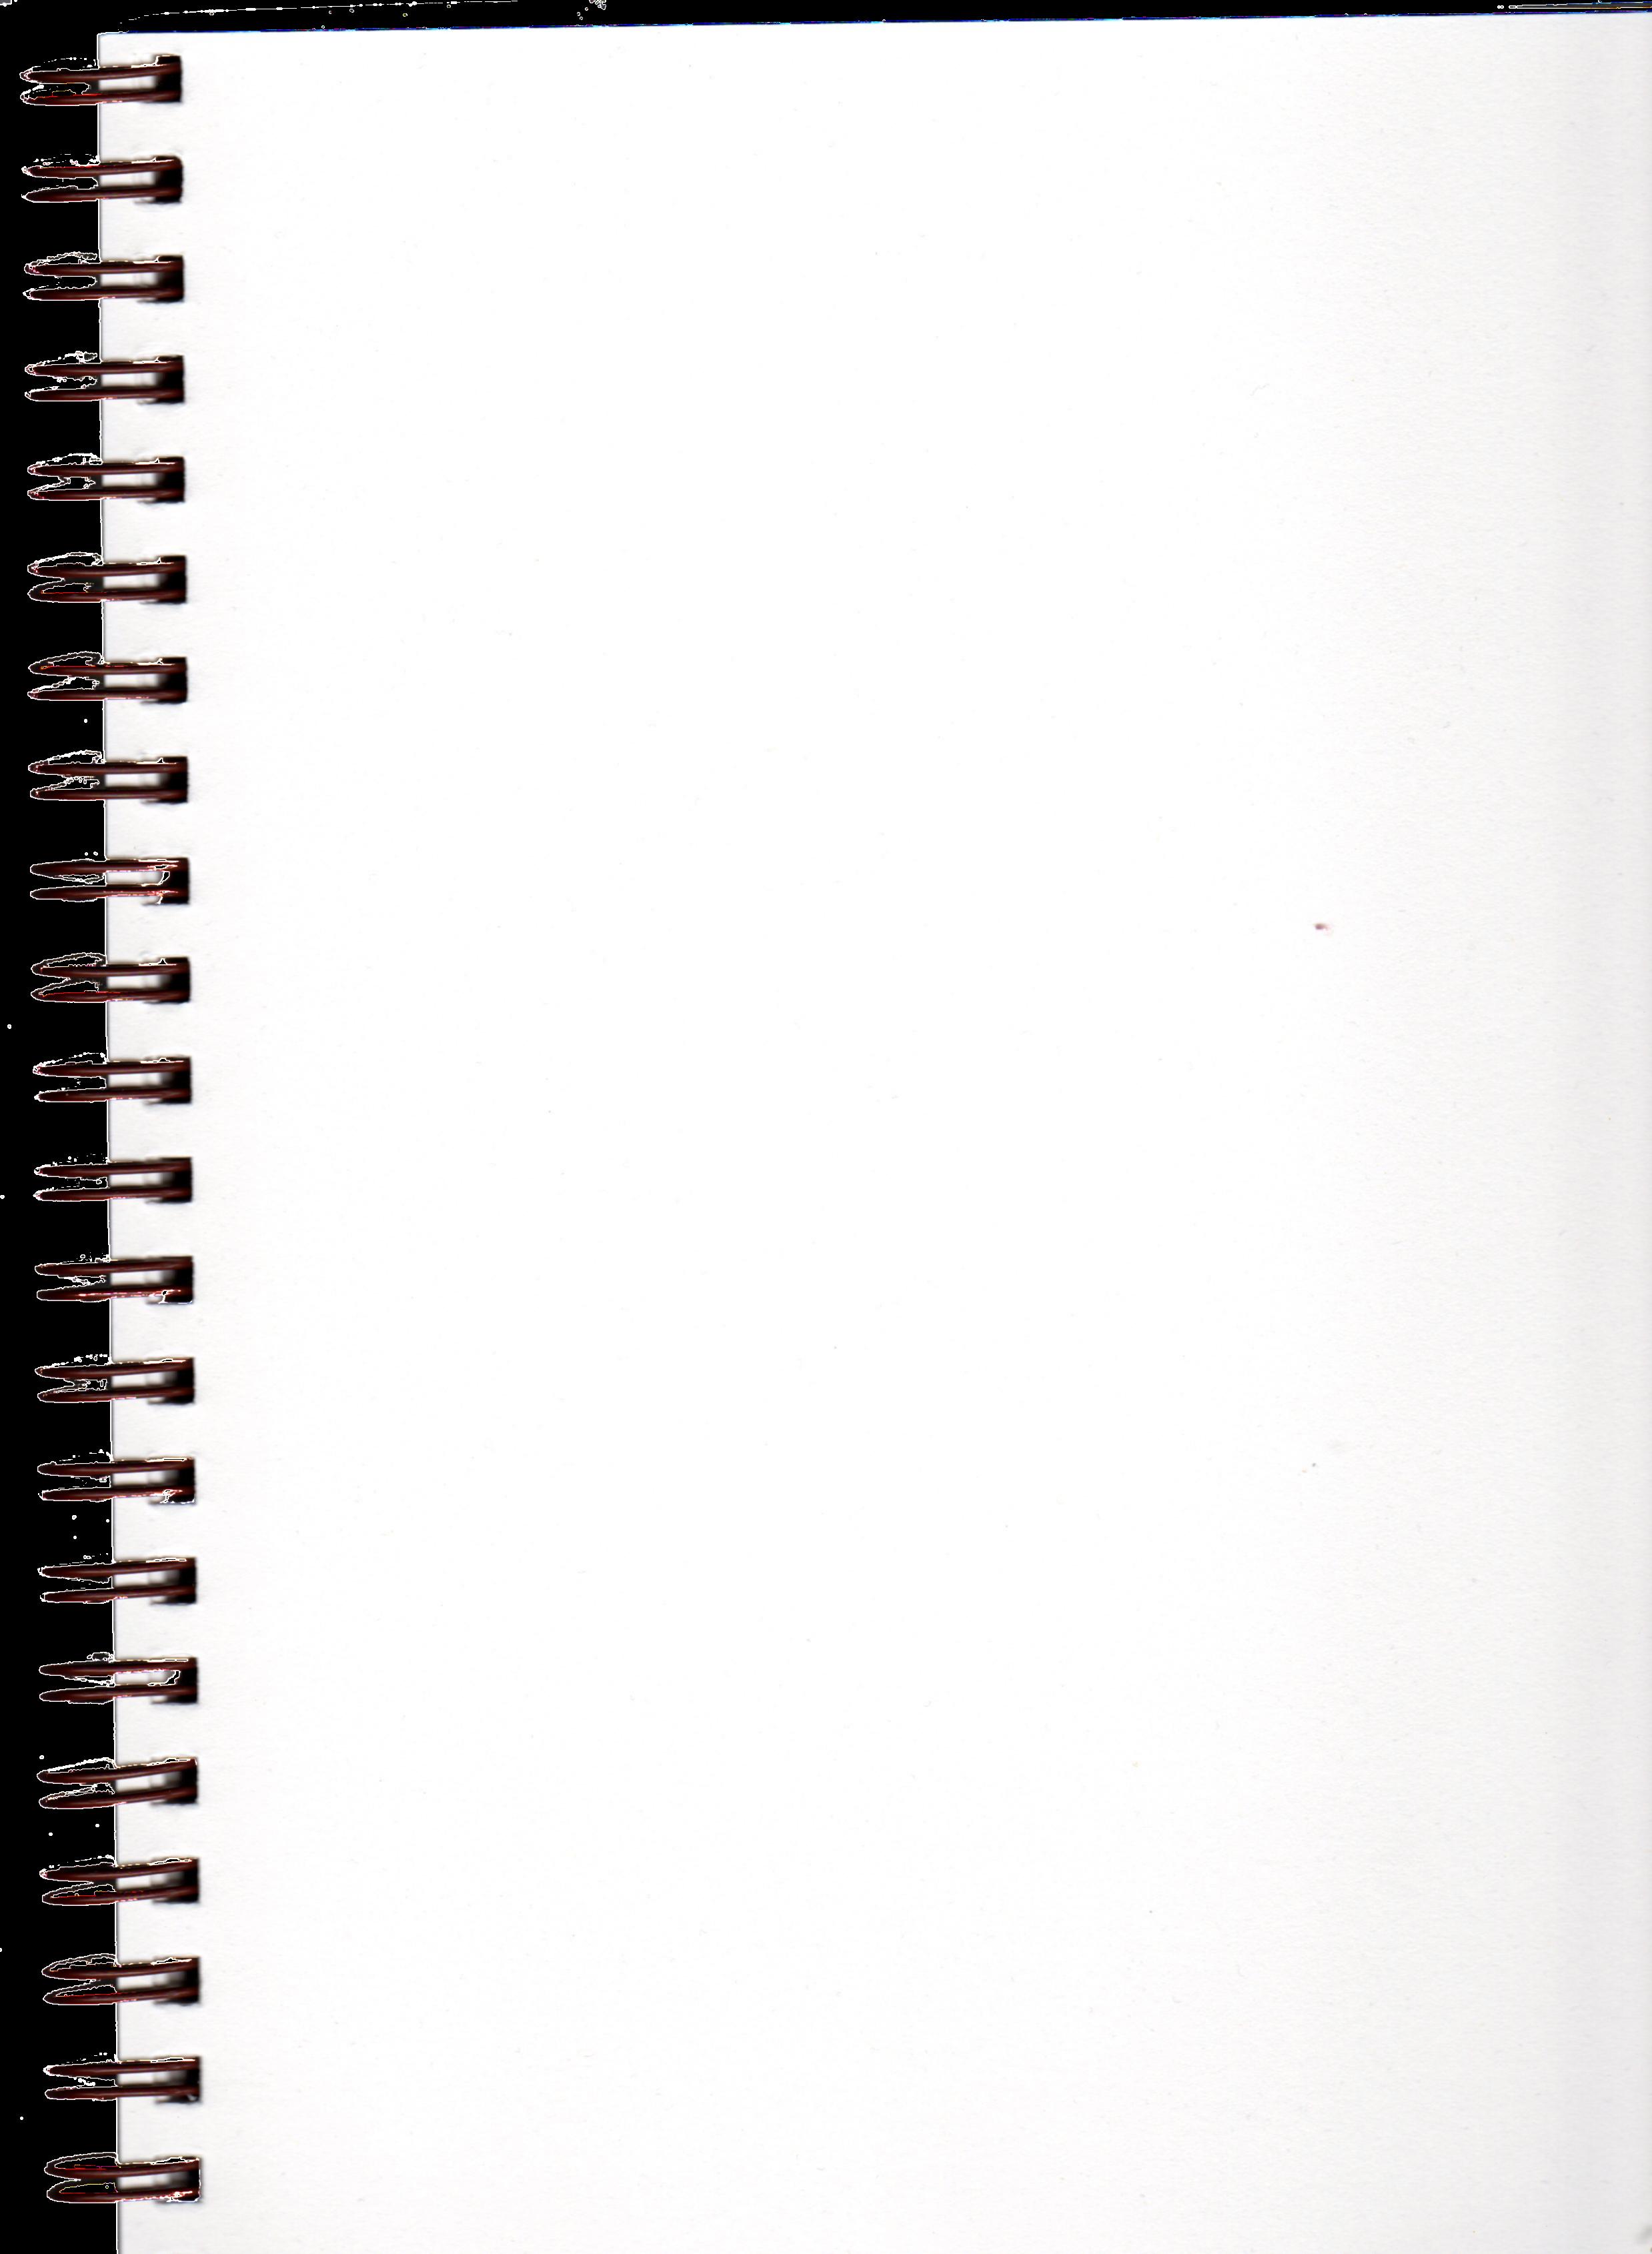 Pre-Cut Blank Spiral Notebook Page by Bnspyrd on DeviantArt